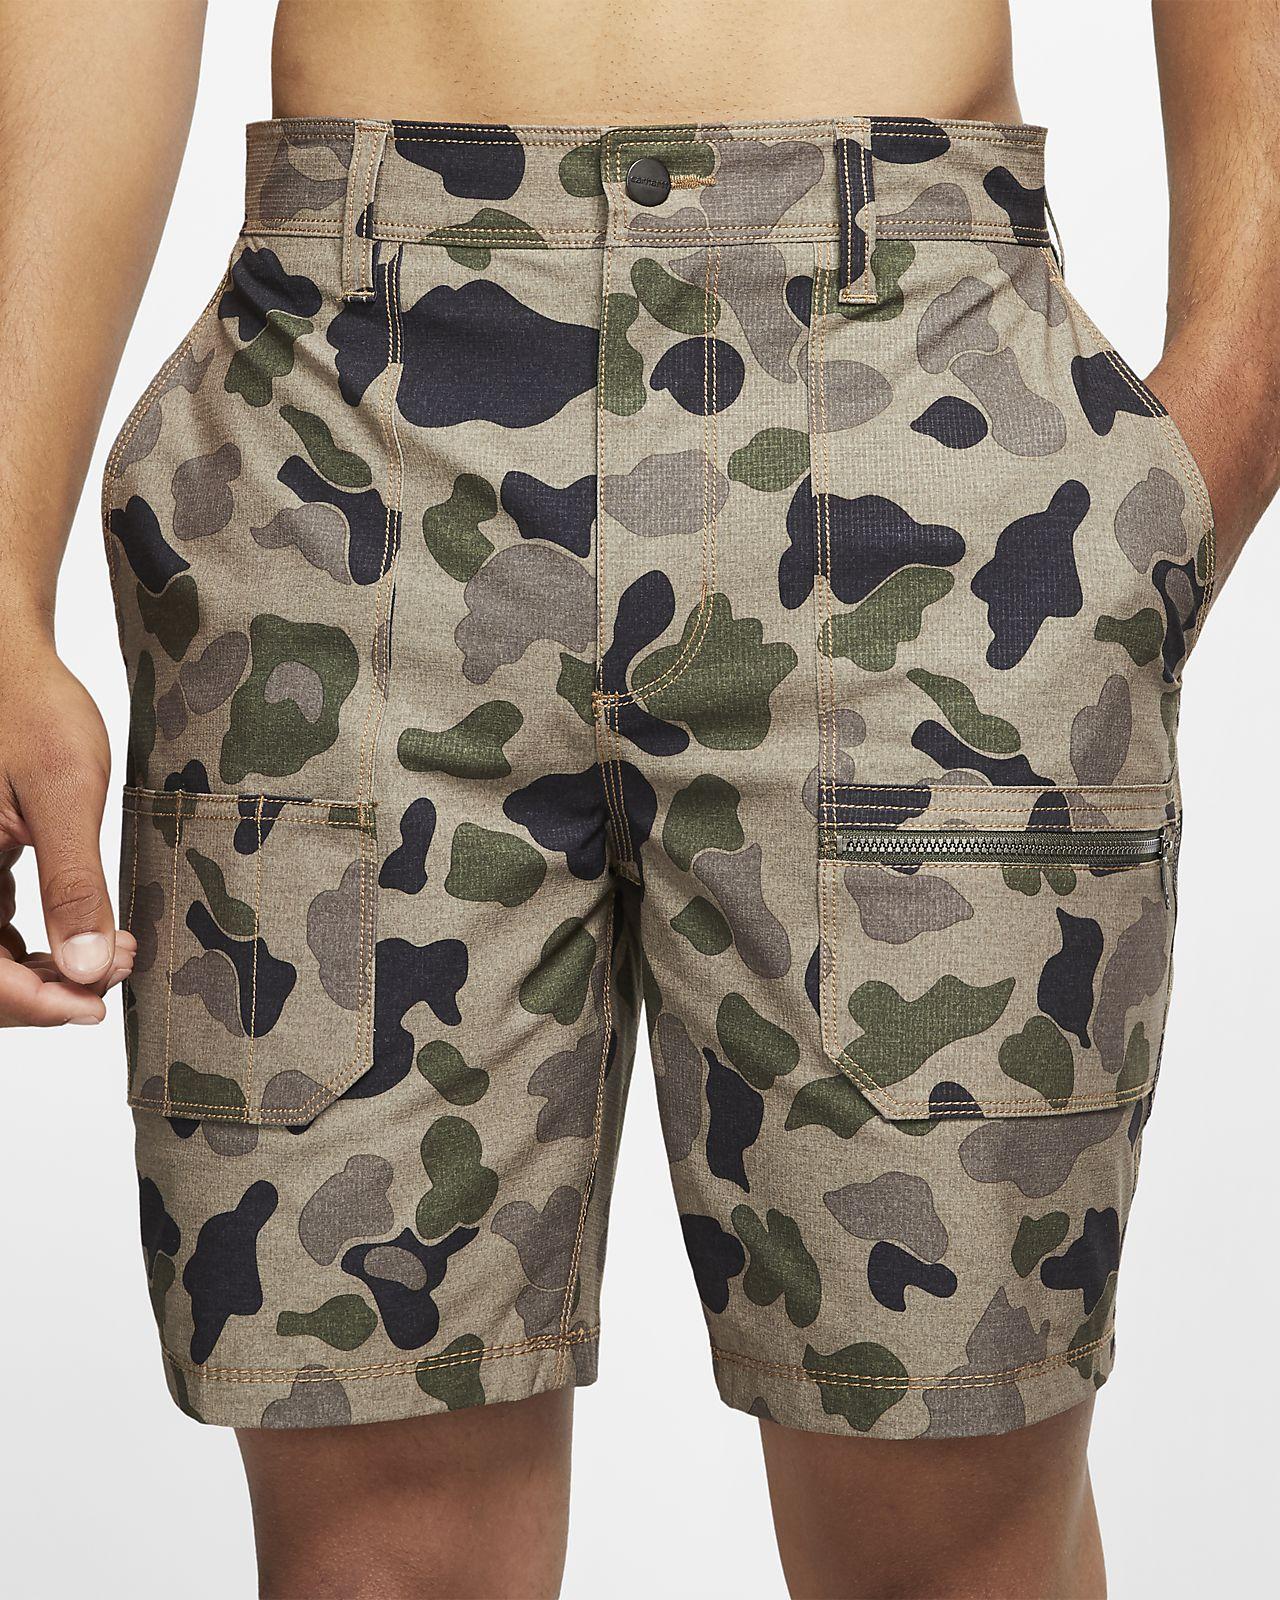 Hurley x Carhartt Men's Camo 48cm approx. Work Shorts